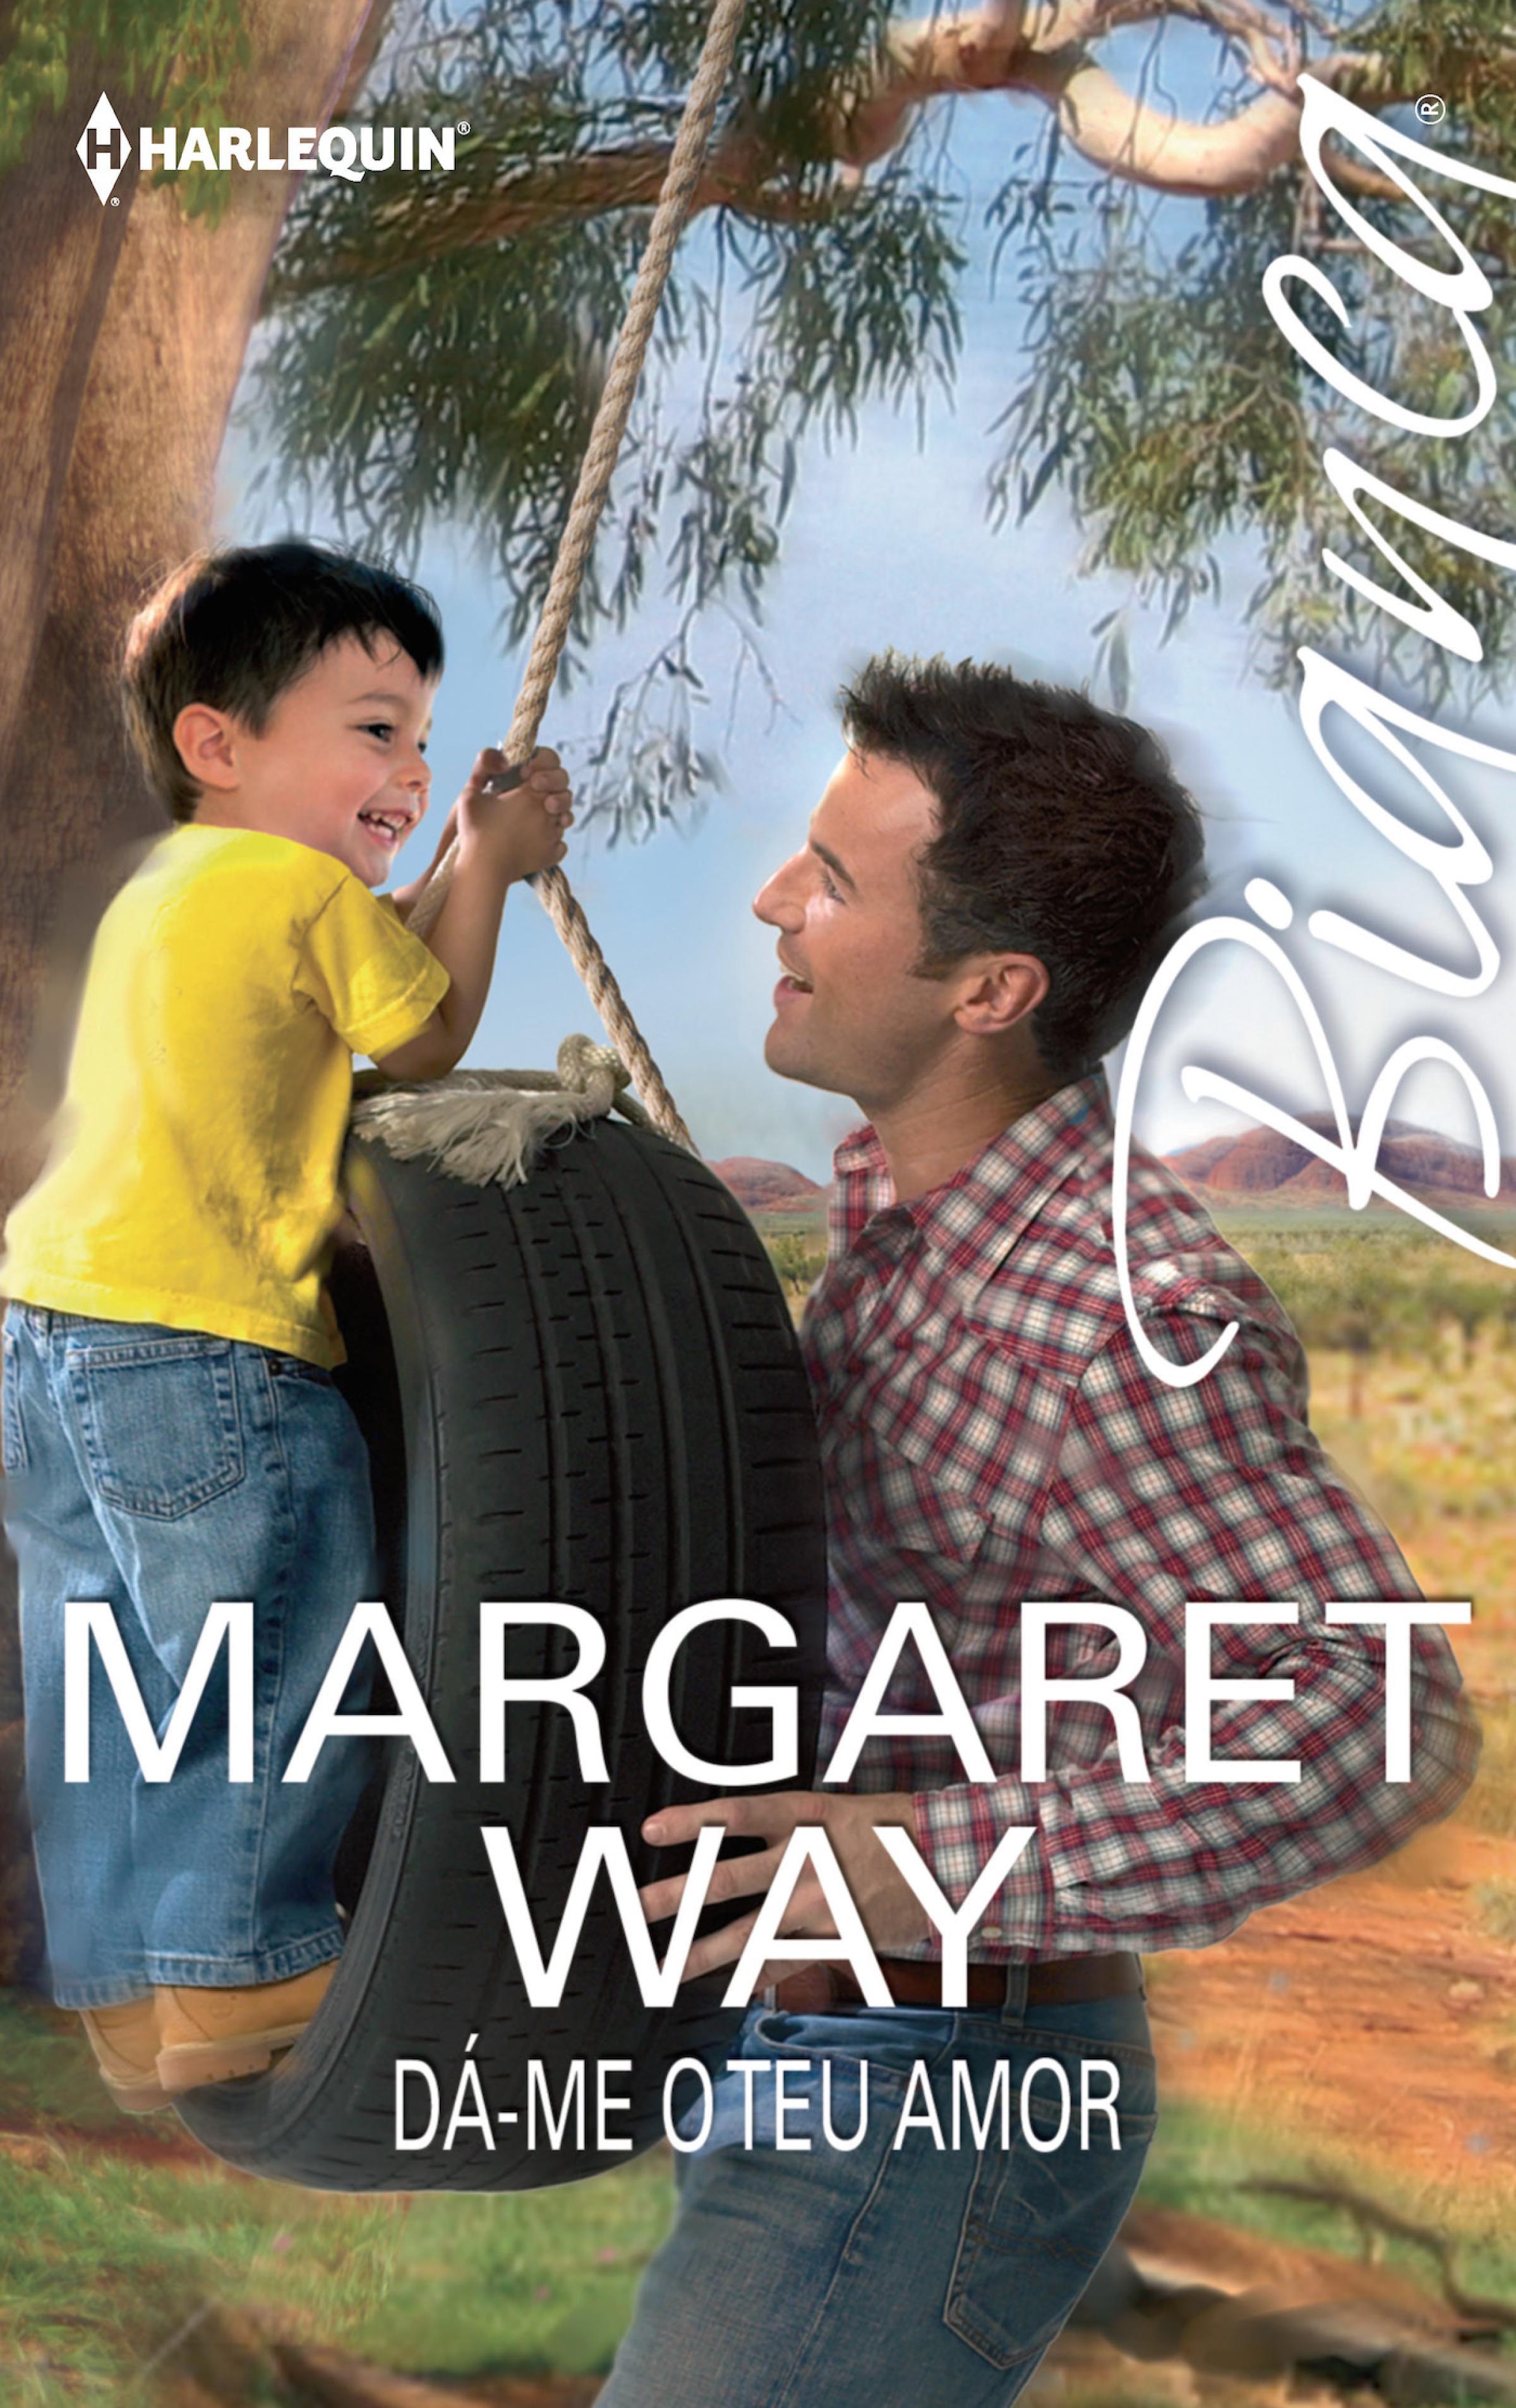 Margaret Way Dá-me o teu amor joanna neil oferece me o teu amor